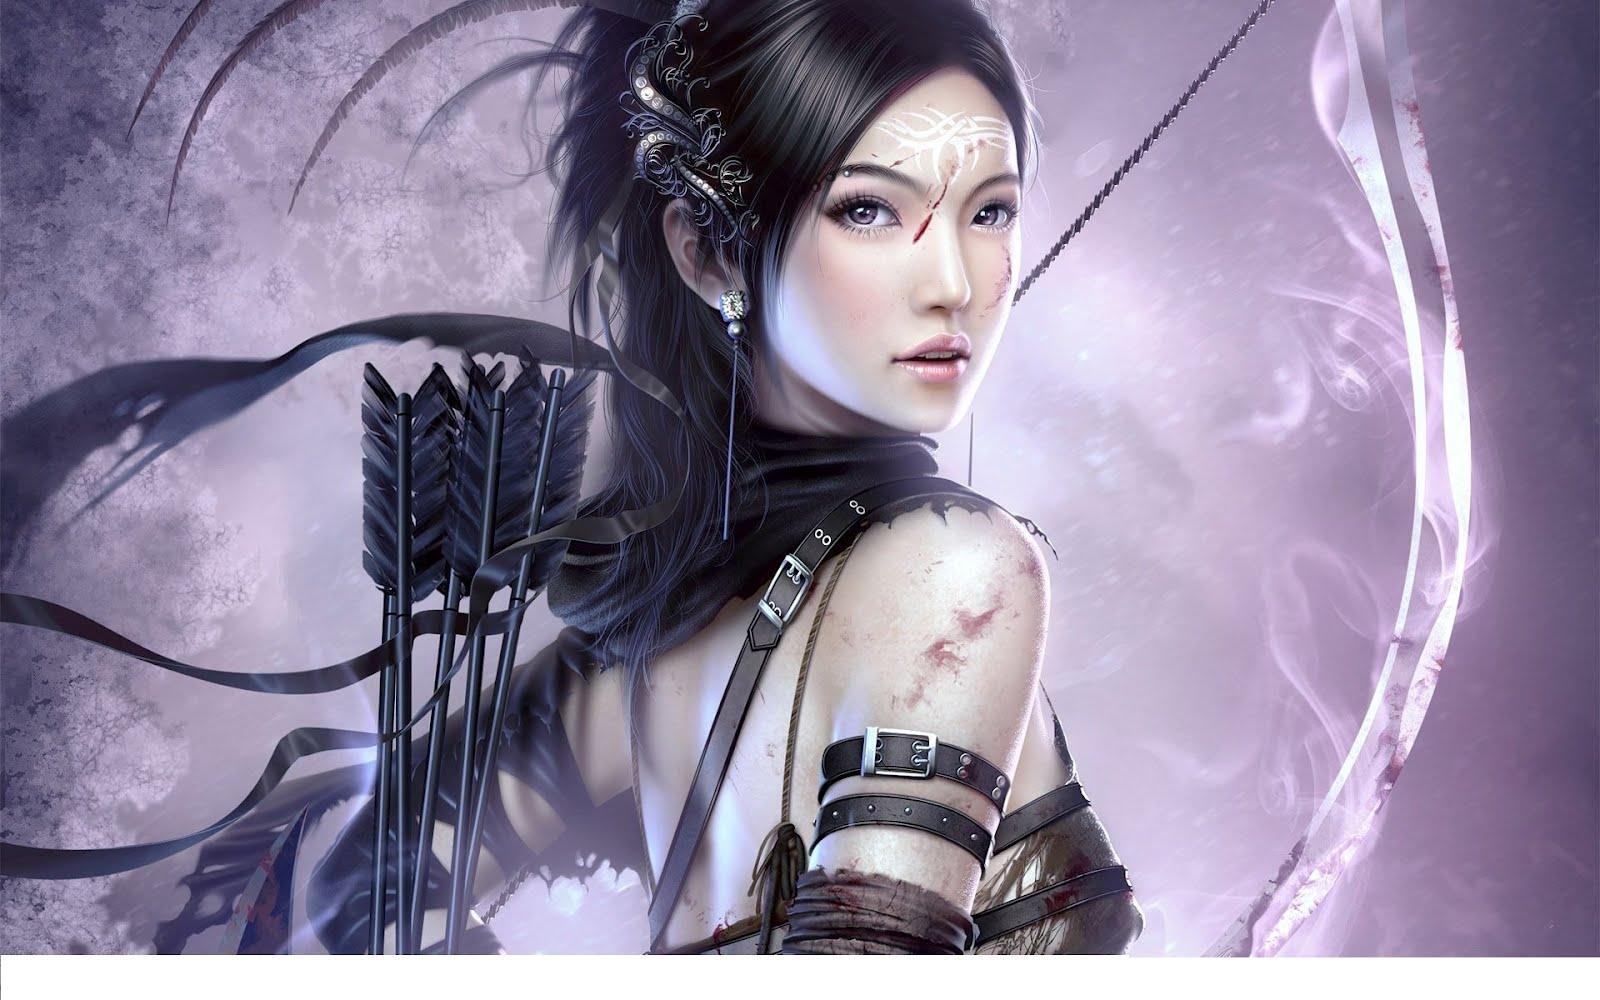 Warrior girl anime character hd wallpaper download hd - Anime female warrior ...